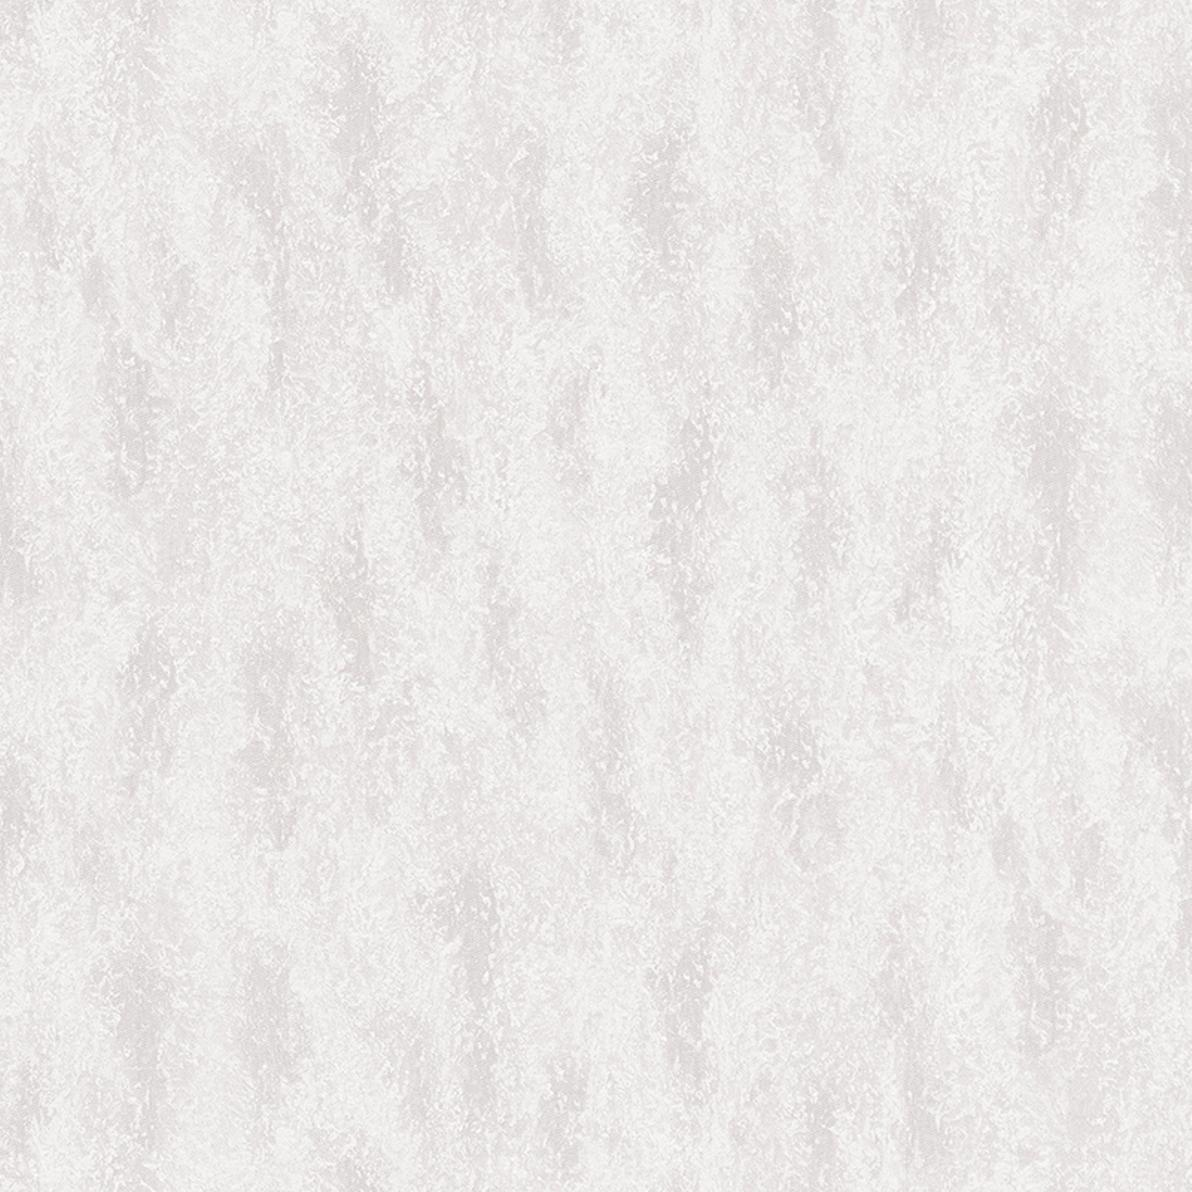 Обои Decori & Decori Bukhara 82793